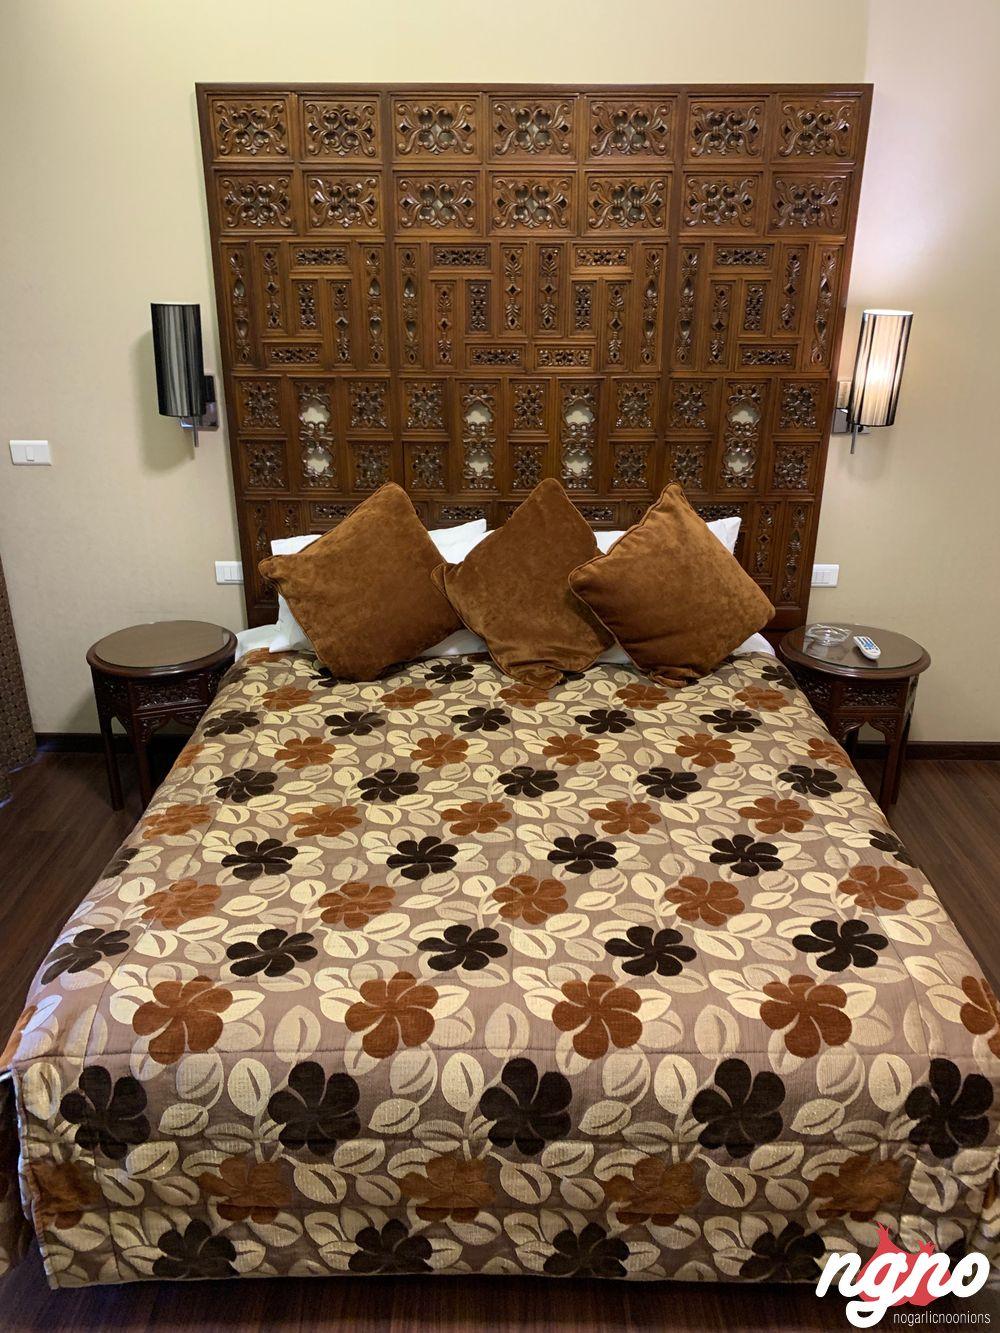 chataura-park-hotel-nogarlicnoonions-702019-07-24-01-21-47